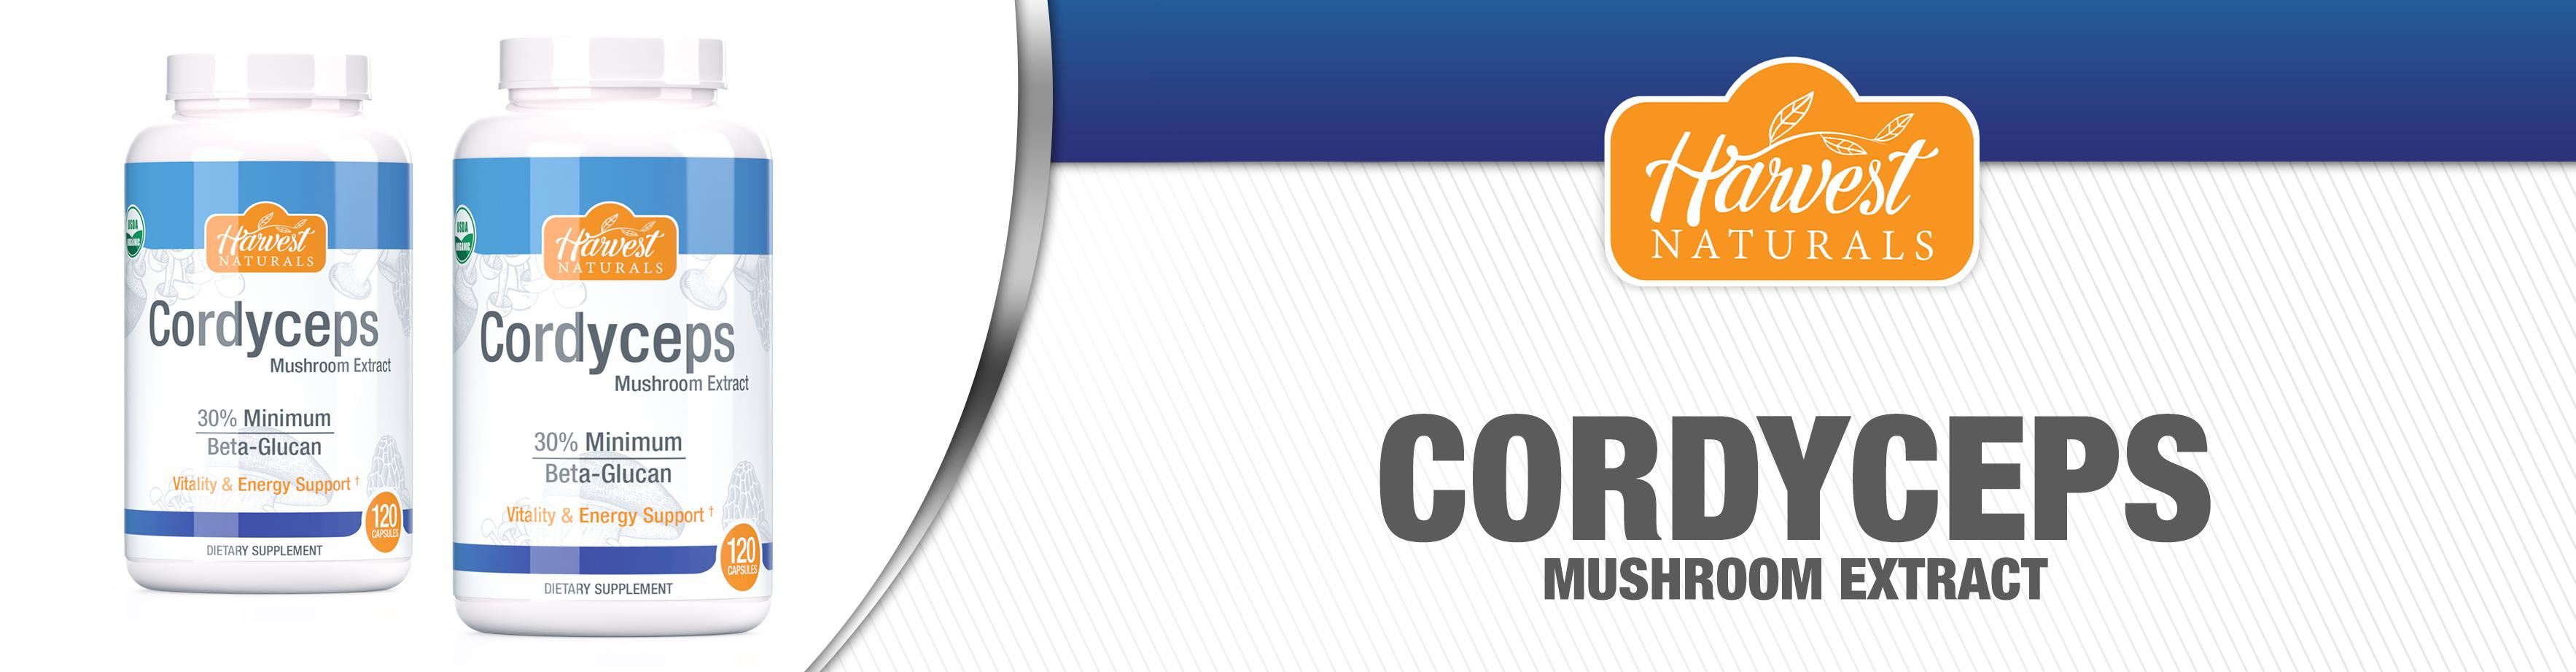 cordyceps-mushroom-capsules-10-21.jpg